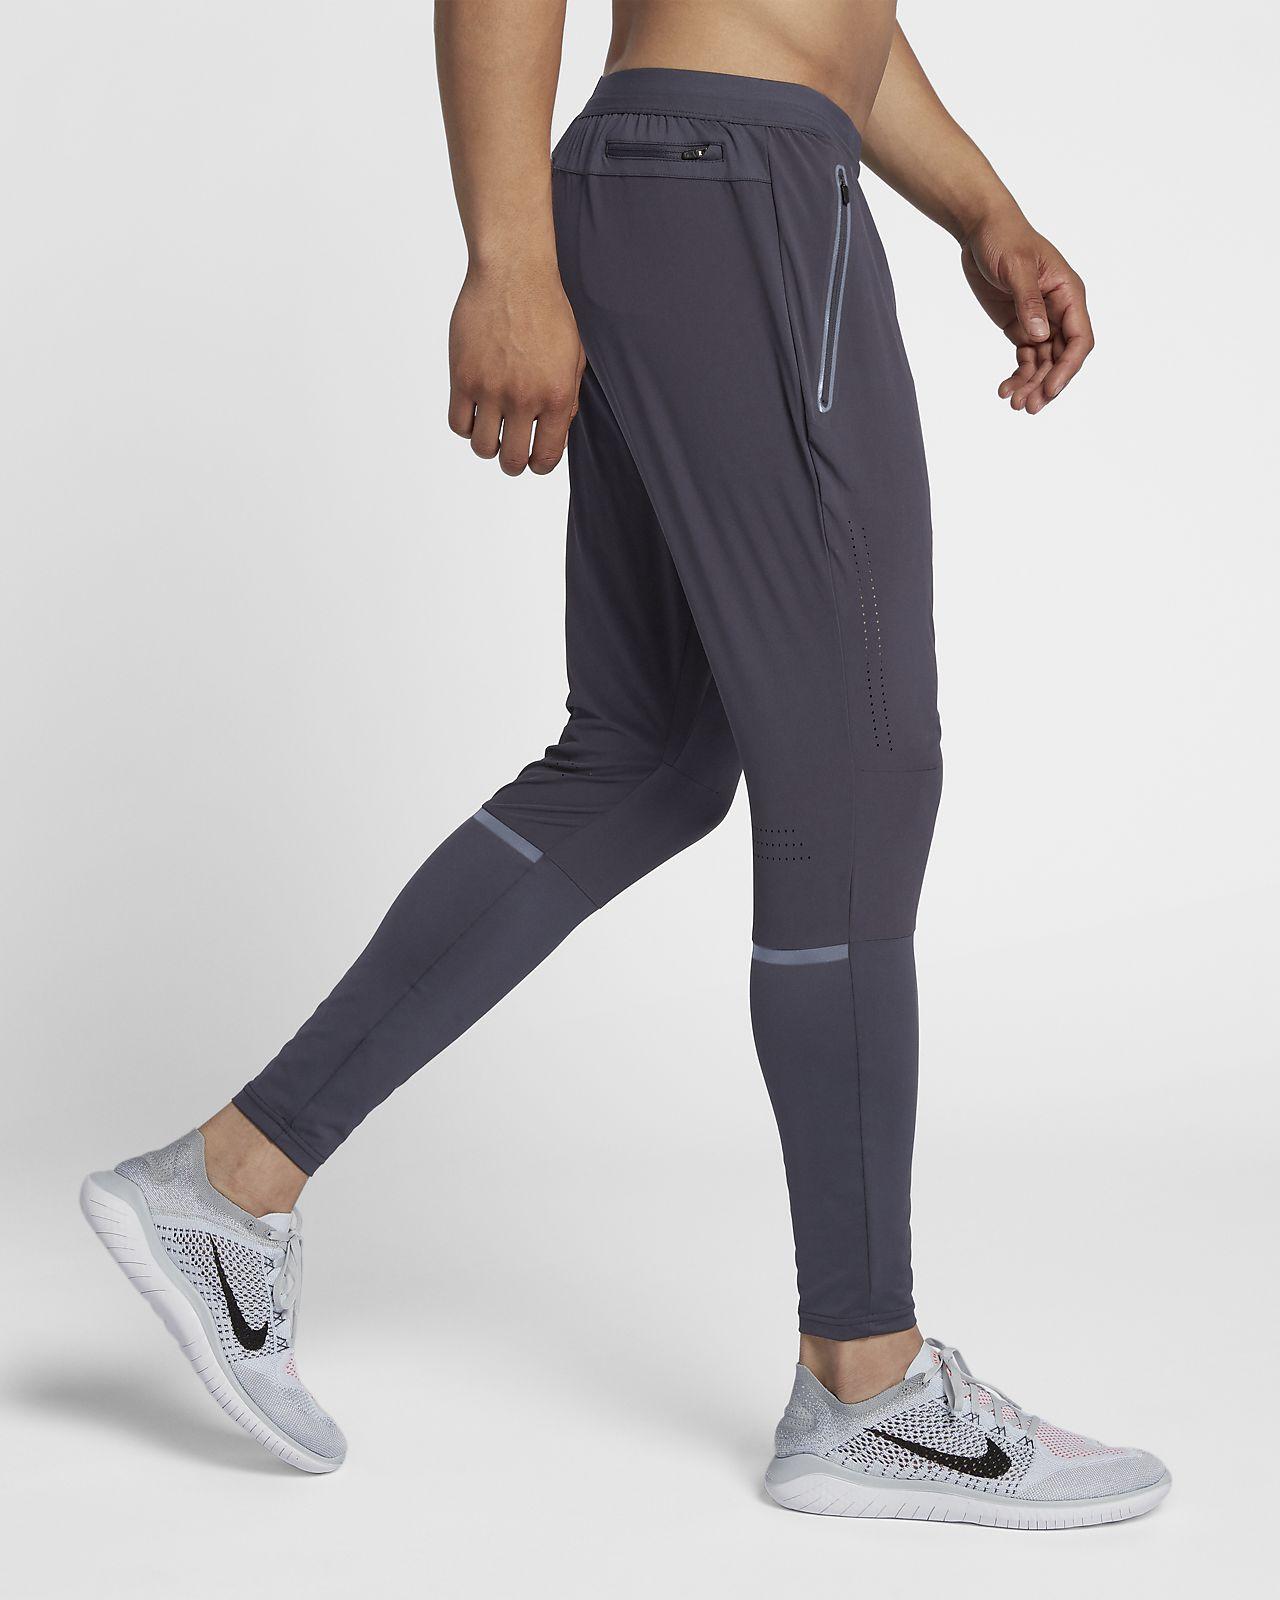 baf5d35a0dff56 Nike Swift Herren-Laufhose. Nike.com AT